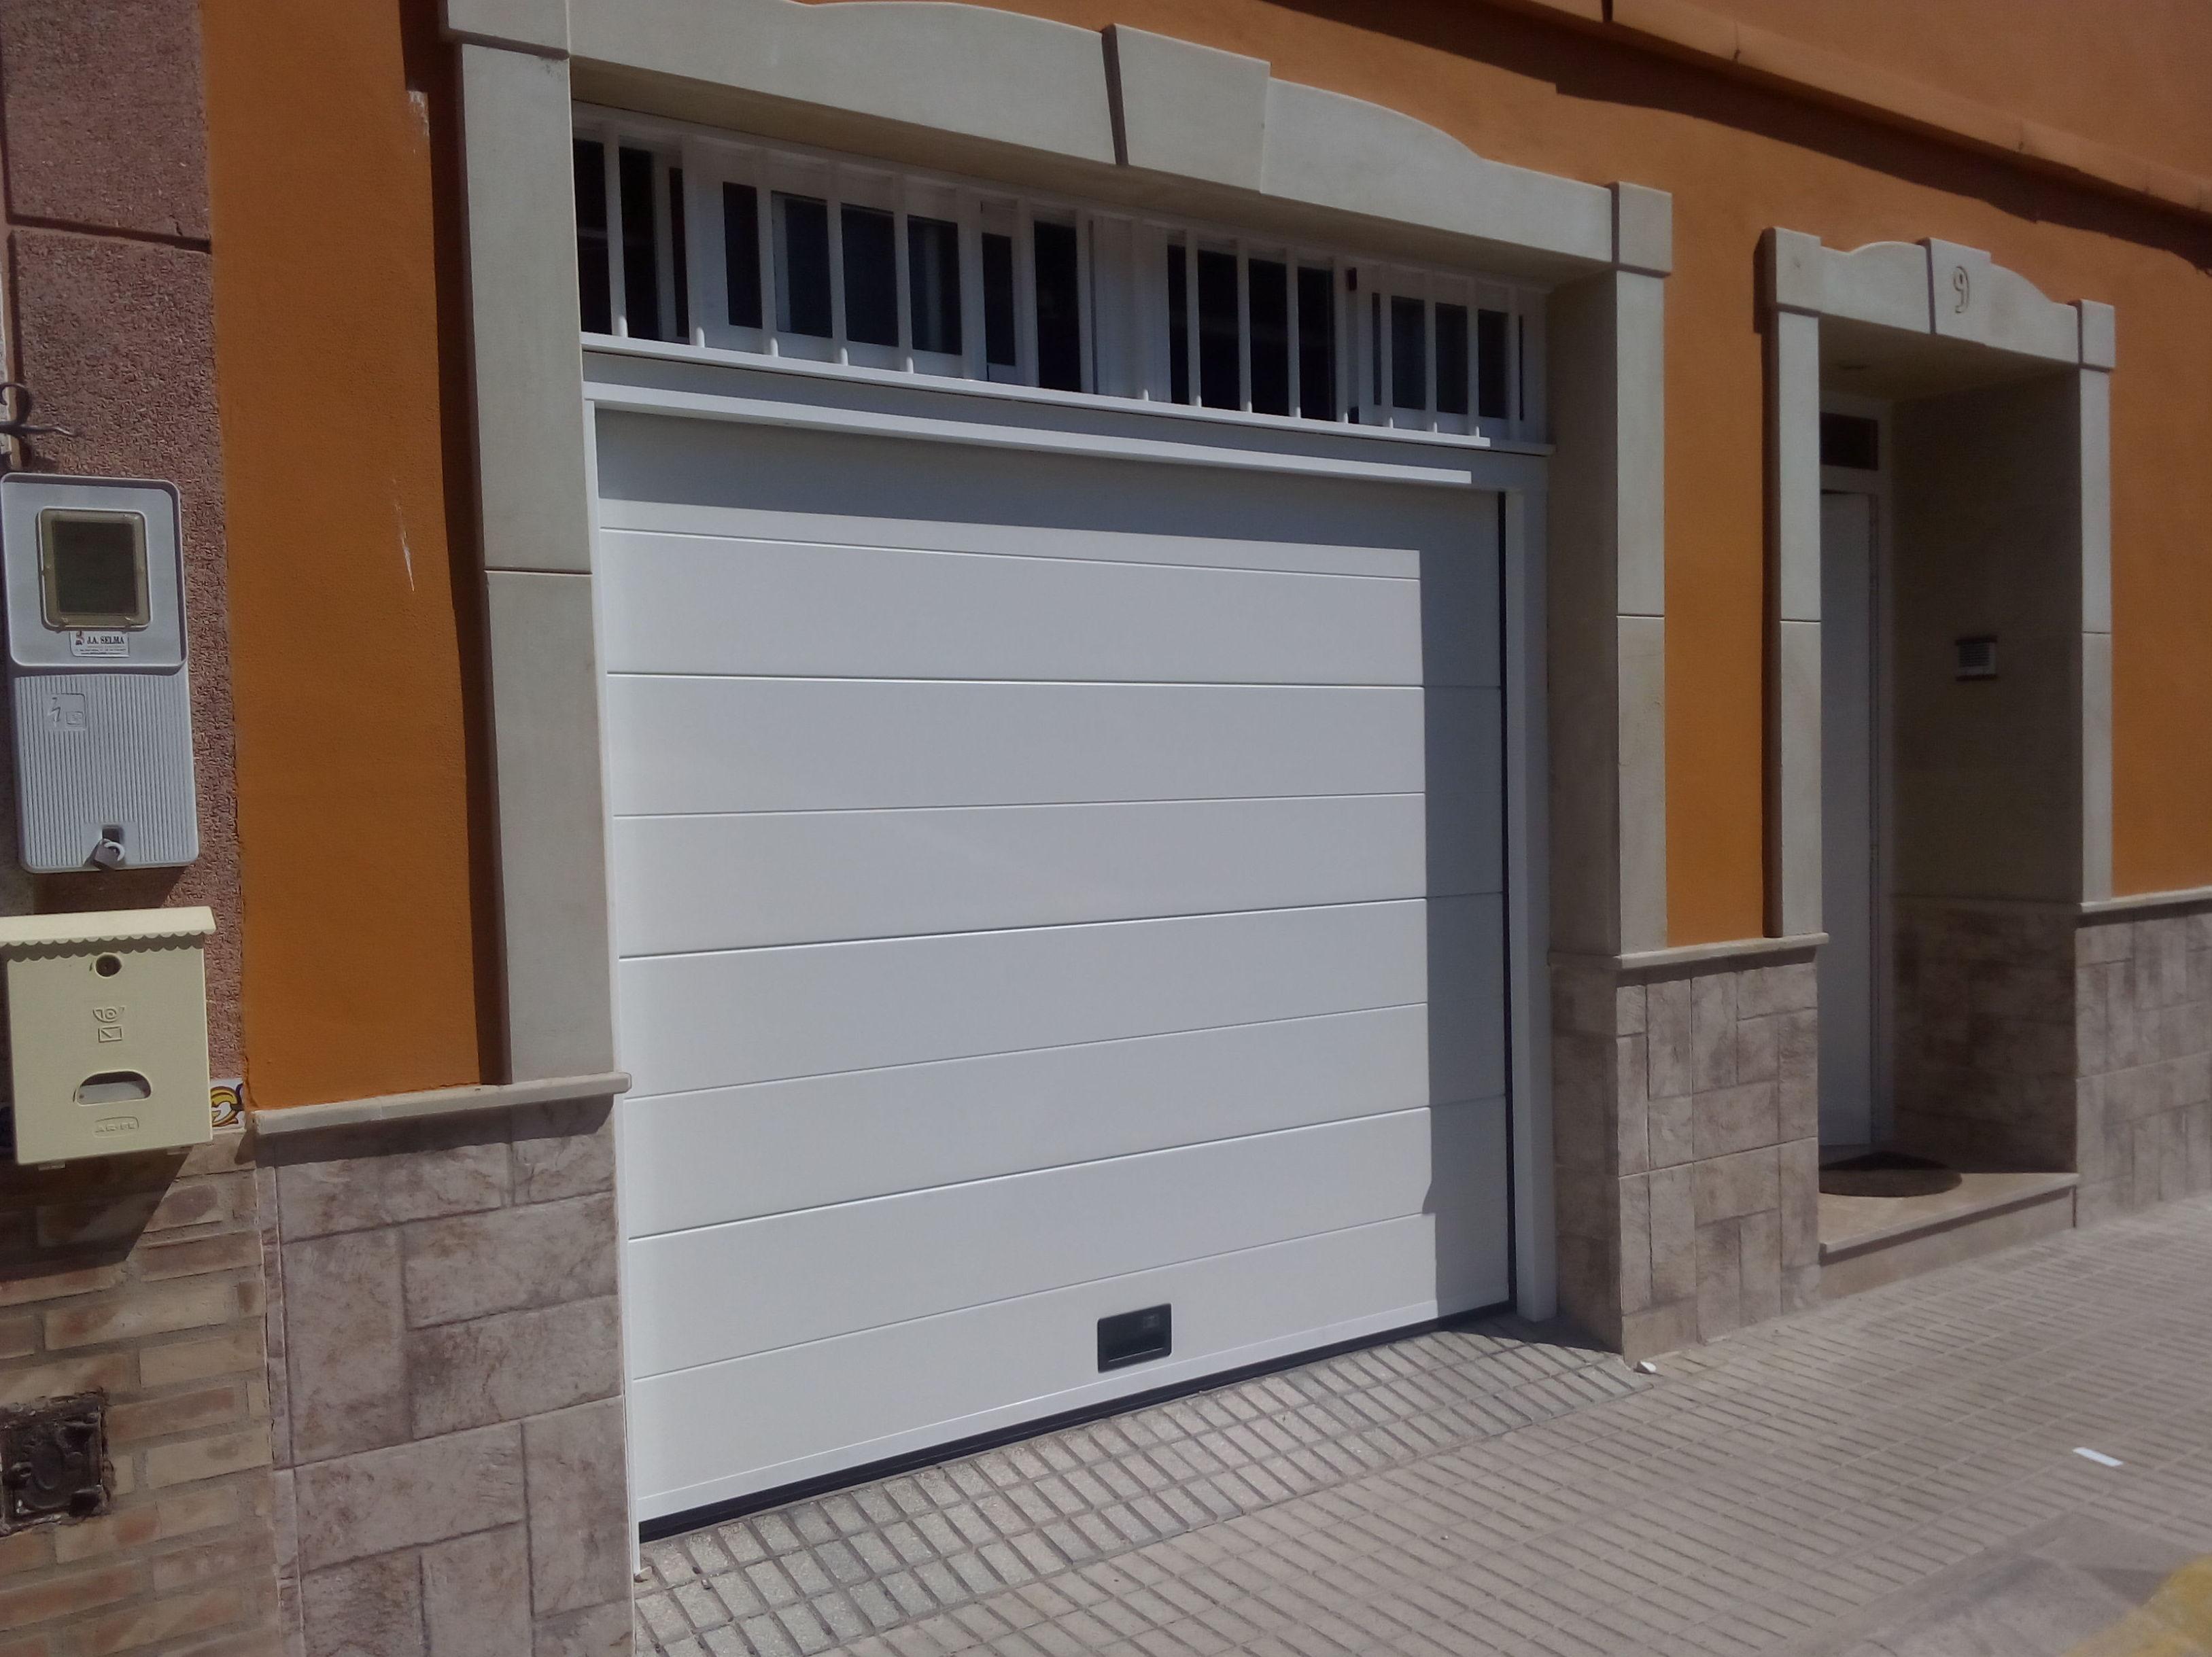 Puerta seccional automática panel liso 1 canal